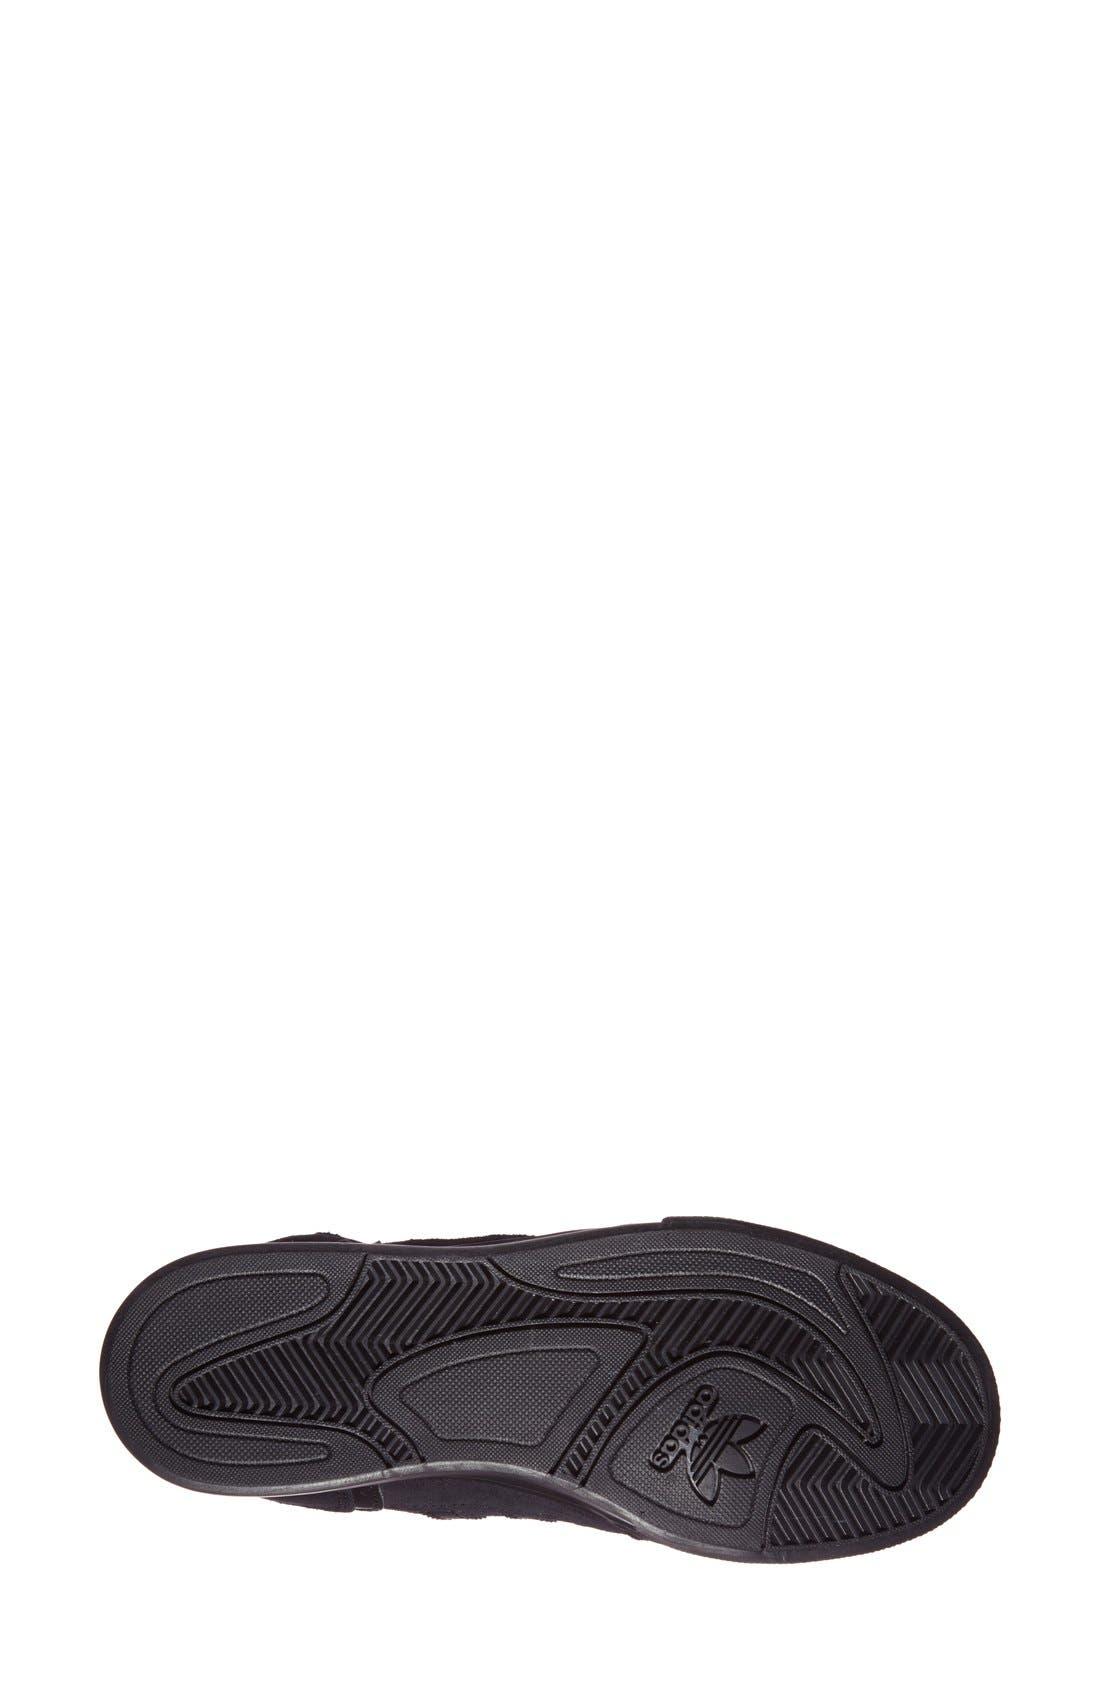 Alternate Image 4  - adidas 'Extaball' Sneaker (Women)